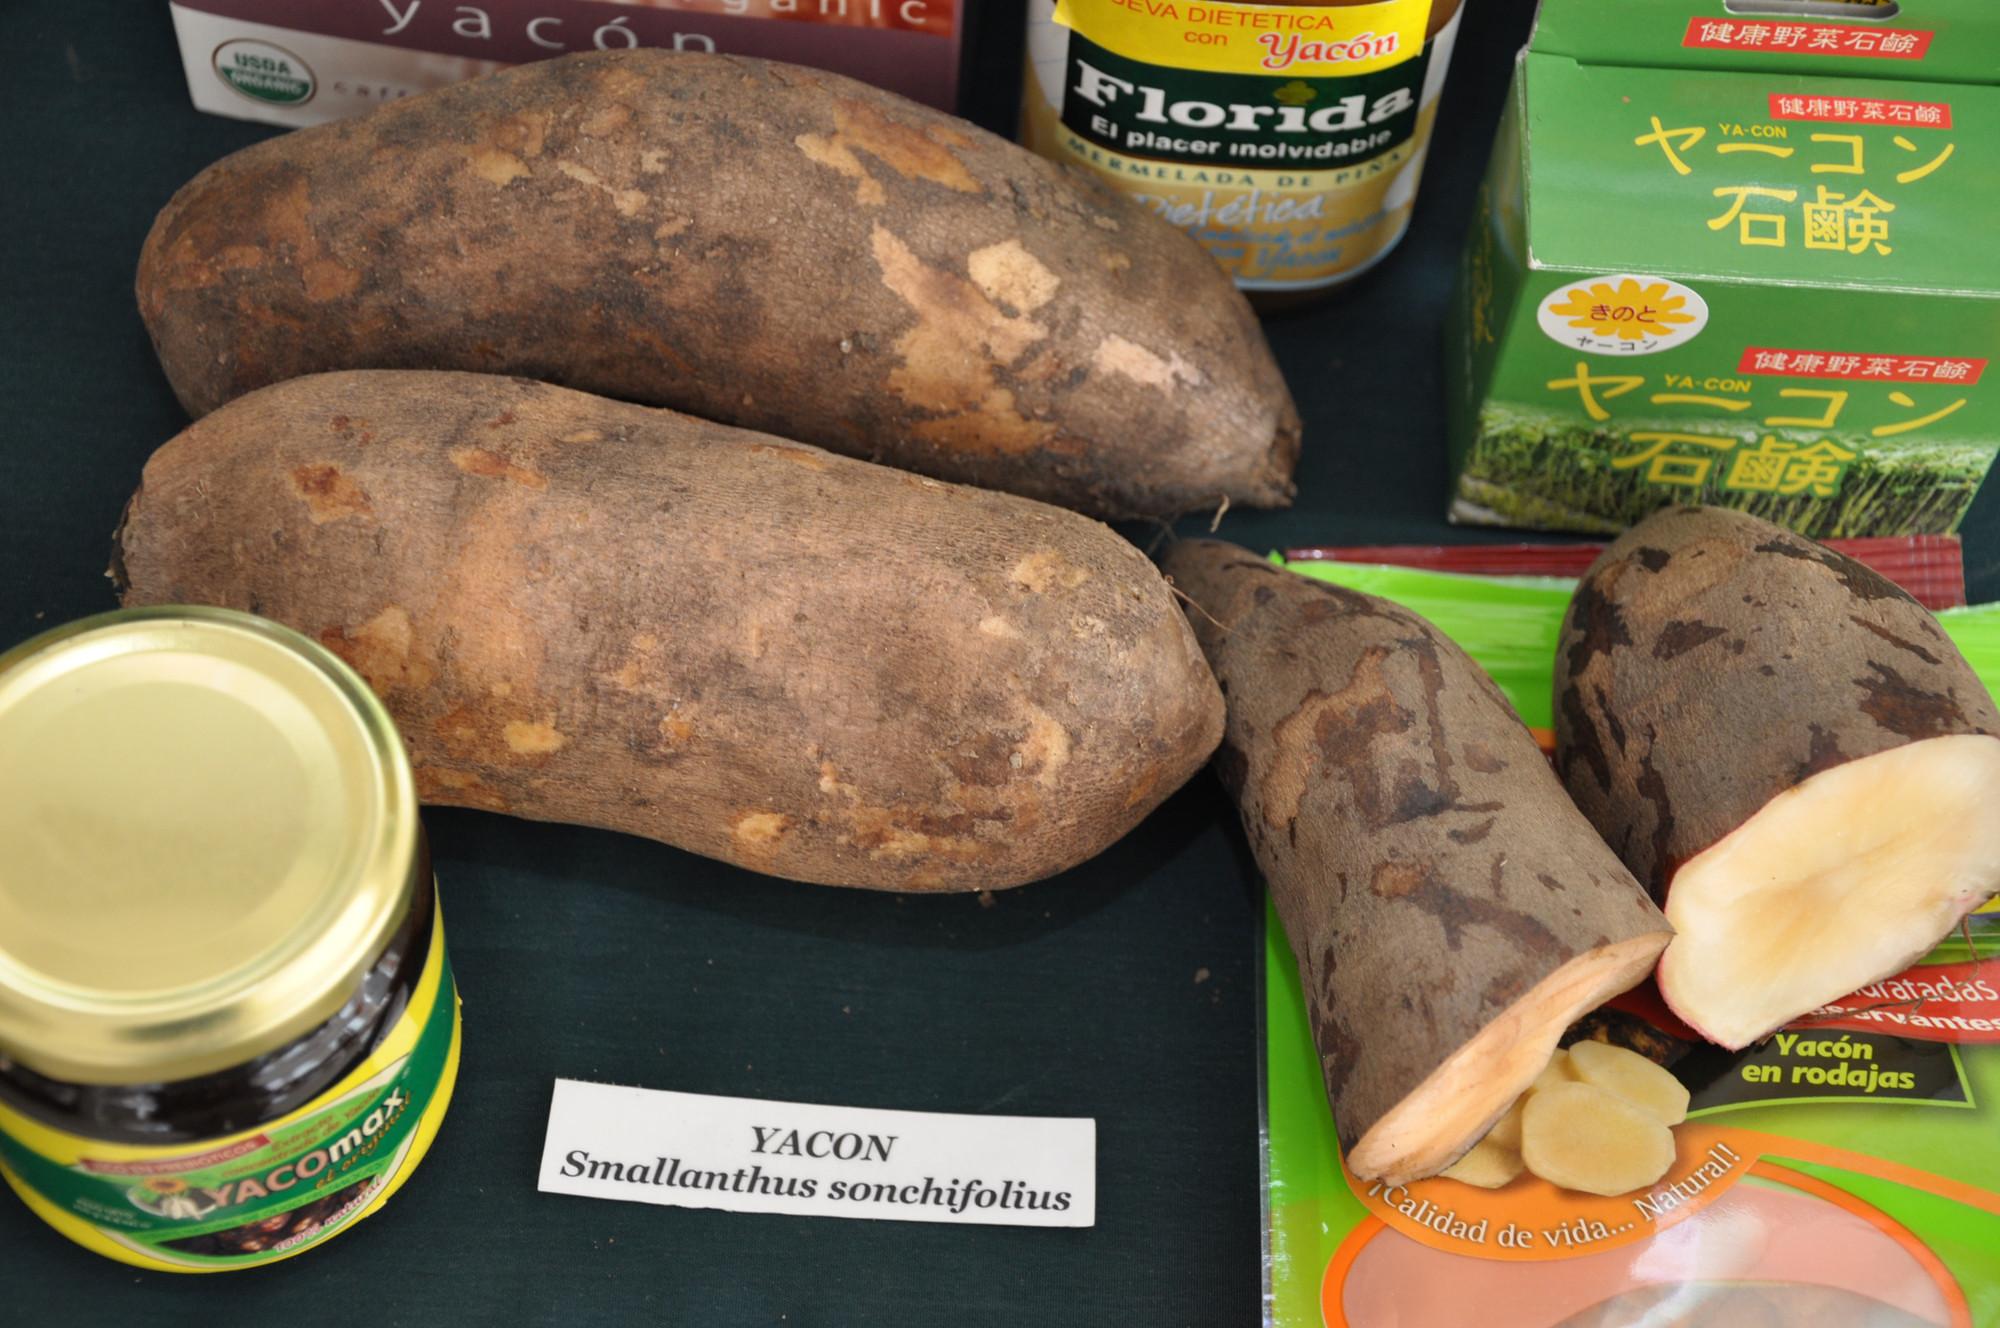 Batata yacon 2